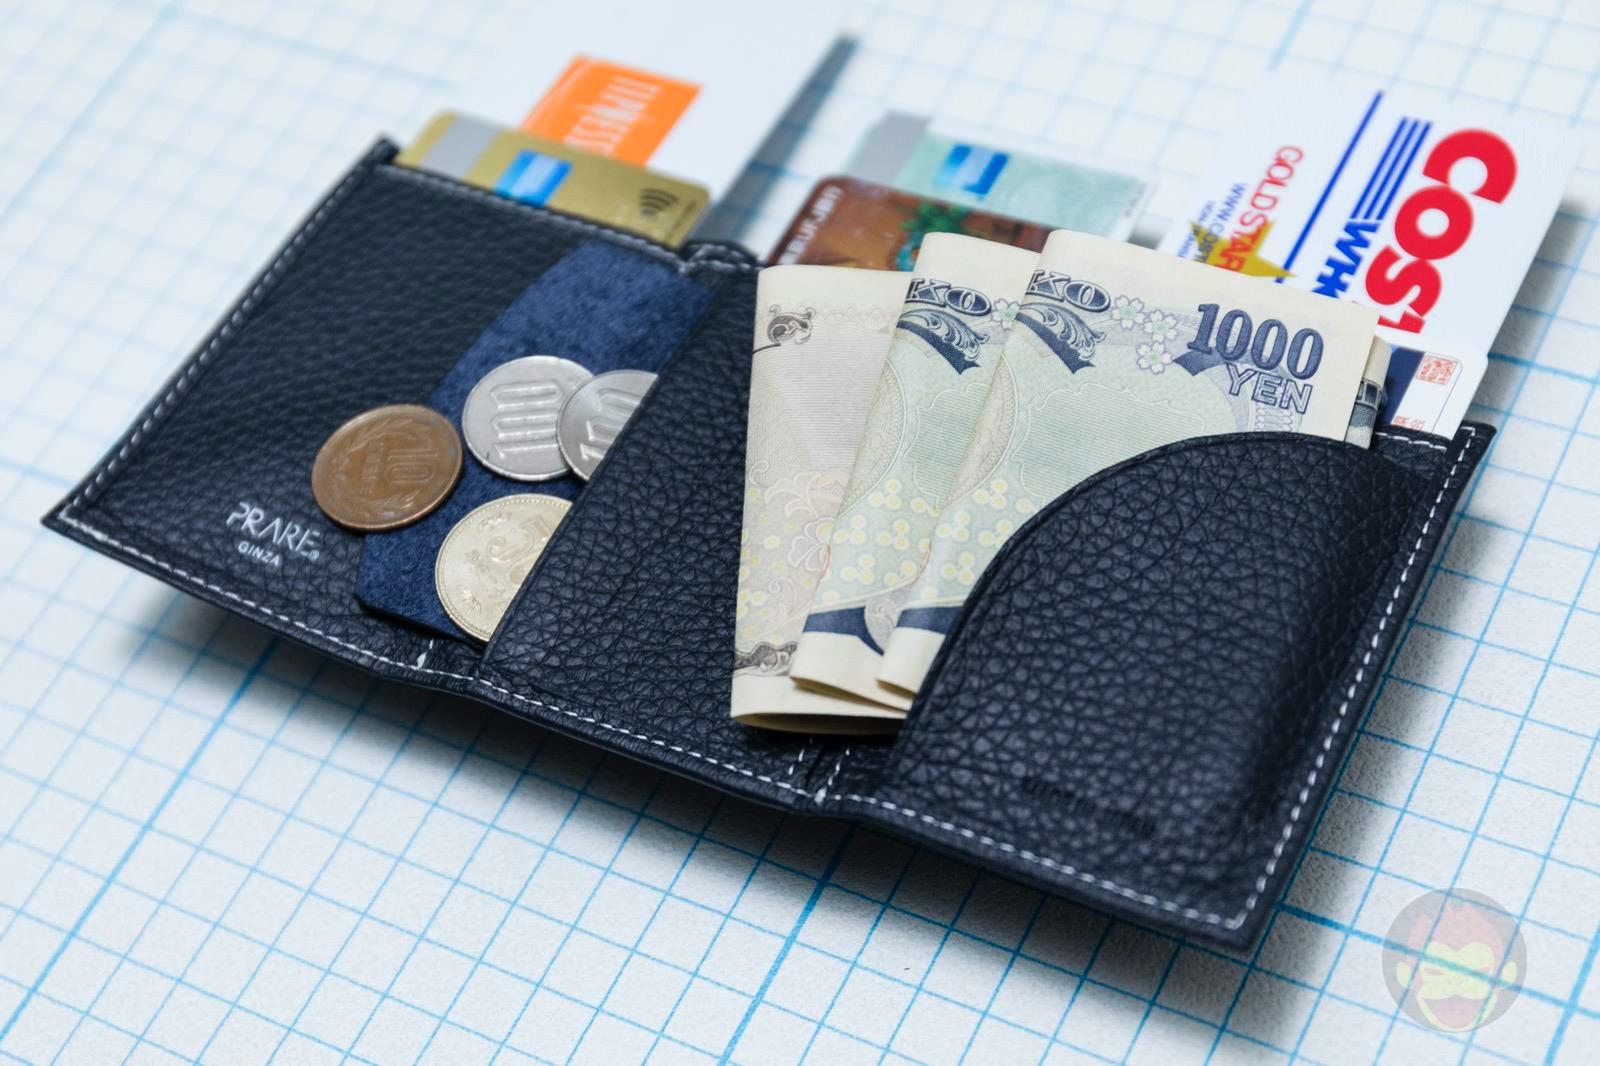 PRESSo pique minimal wallet for cashless 11